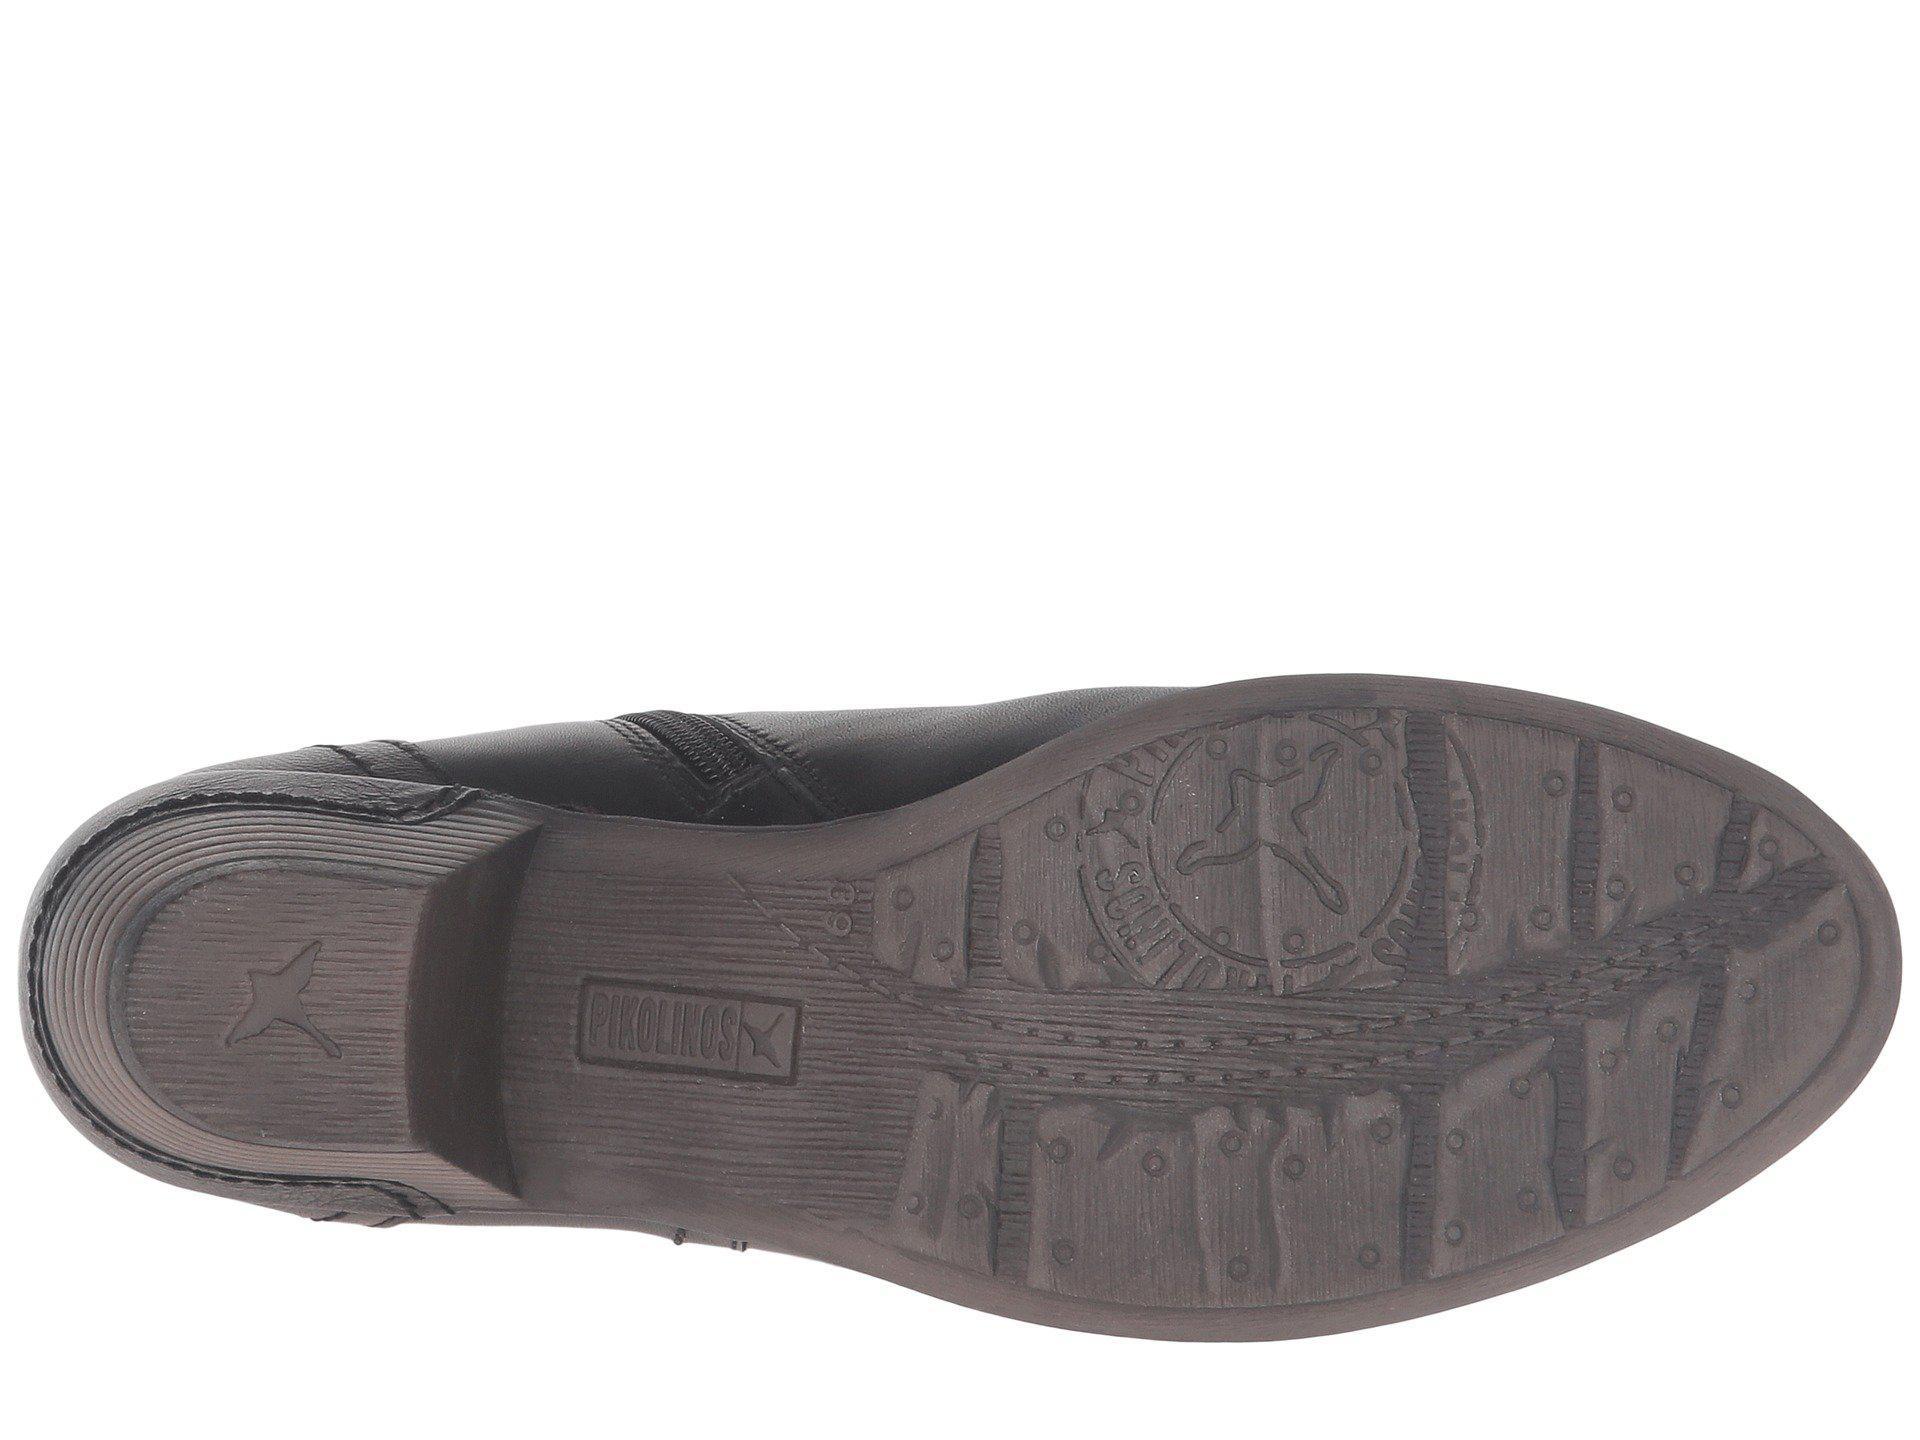 b0a72842d41 Pikolinos - Rotterdam 902-8775 (black) Women s Shoes - Lyst. View fullscreen